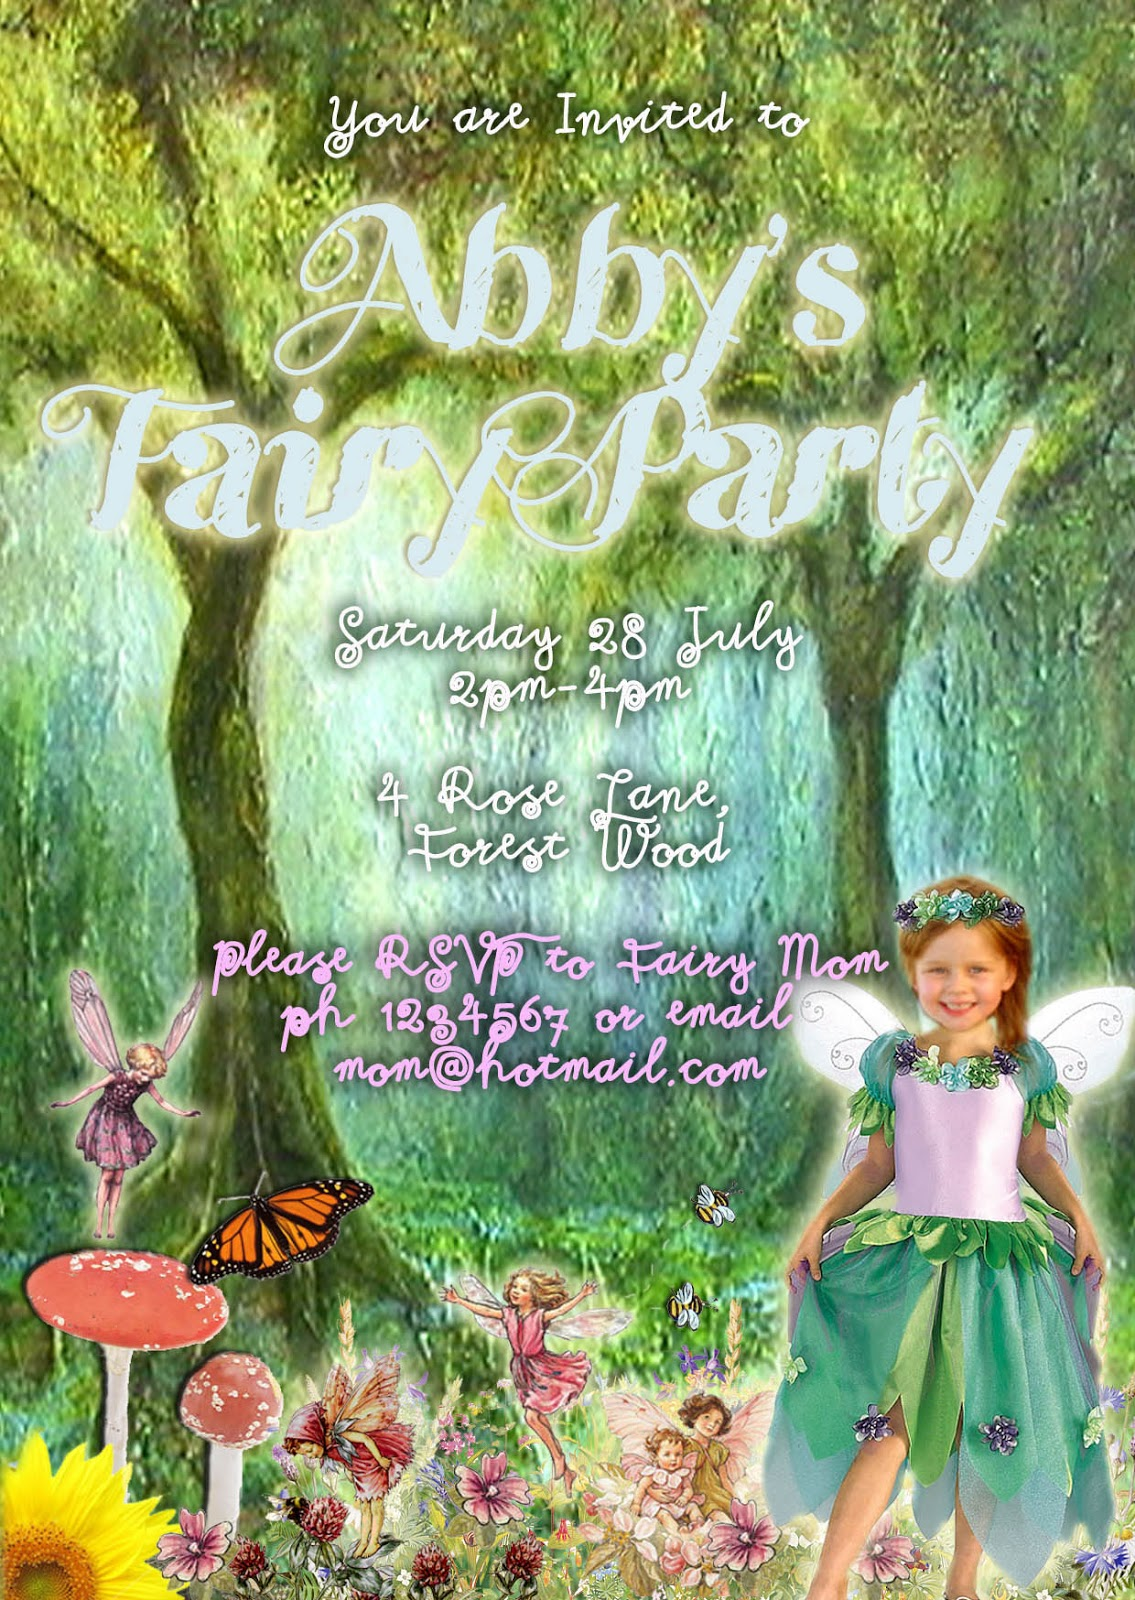 Free Kids Party Invitations Fairy Party Invitation